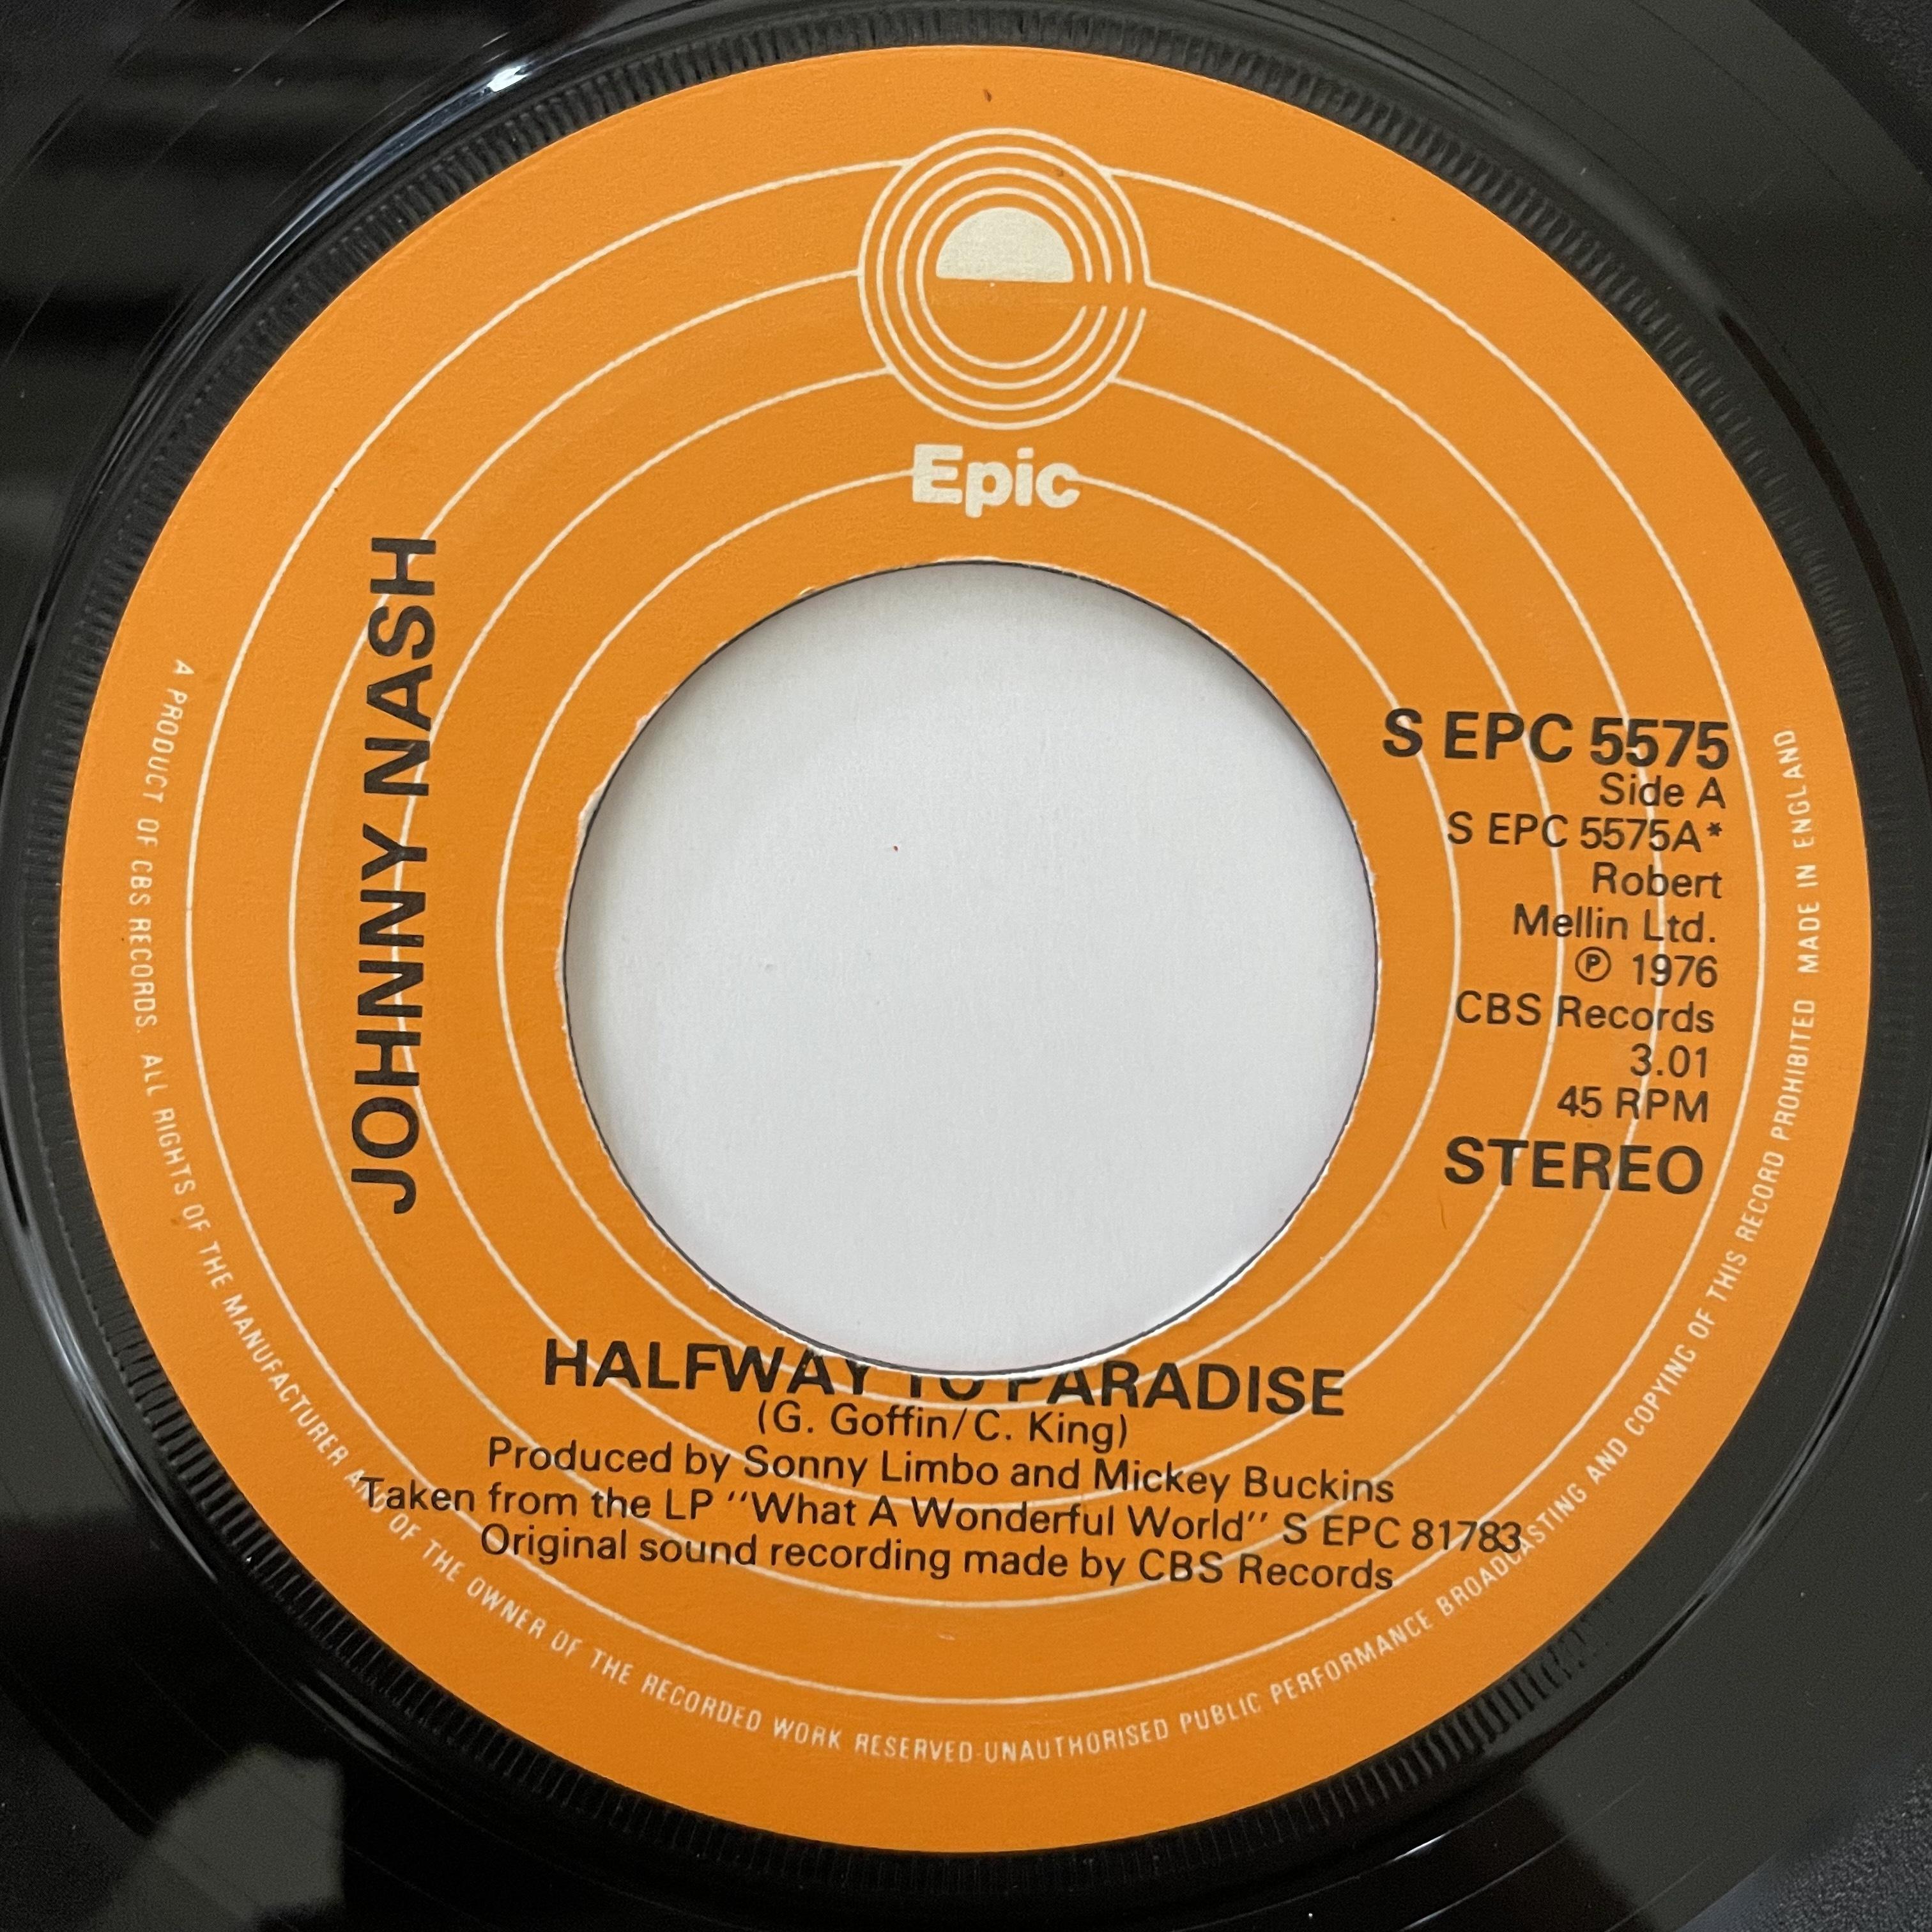 Johnny Nash - Halfway To Paradise【7-20719】